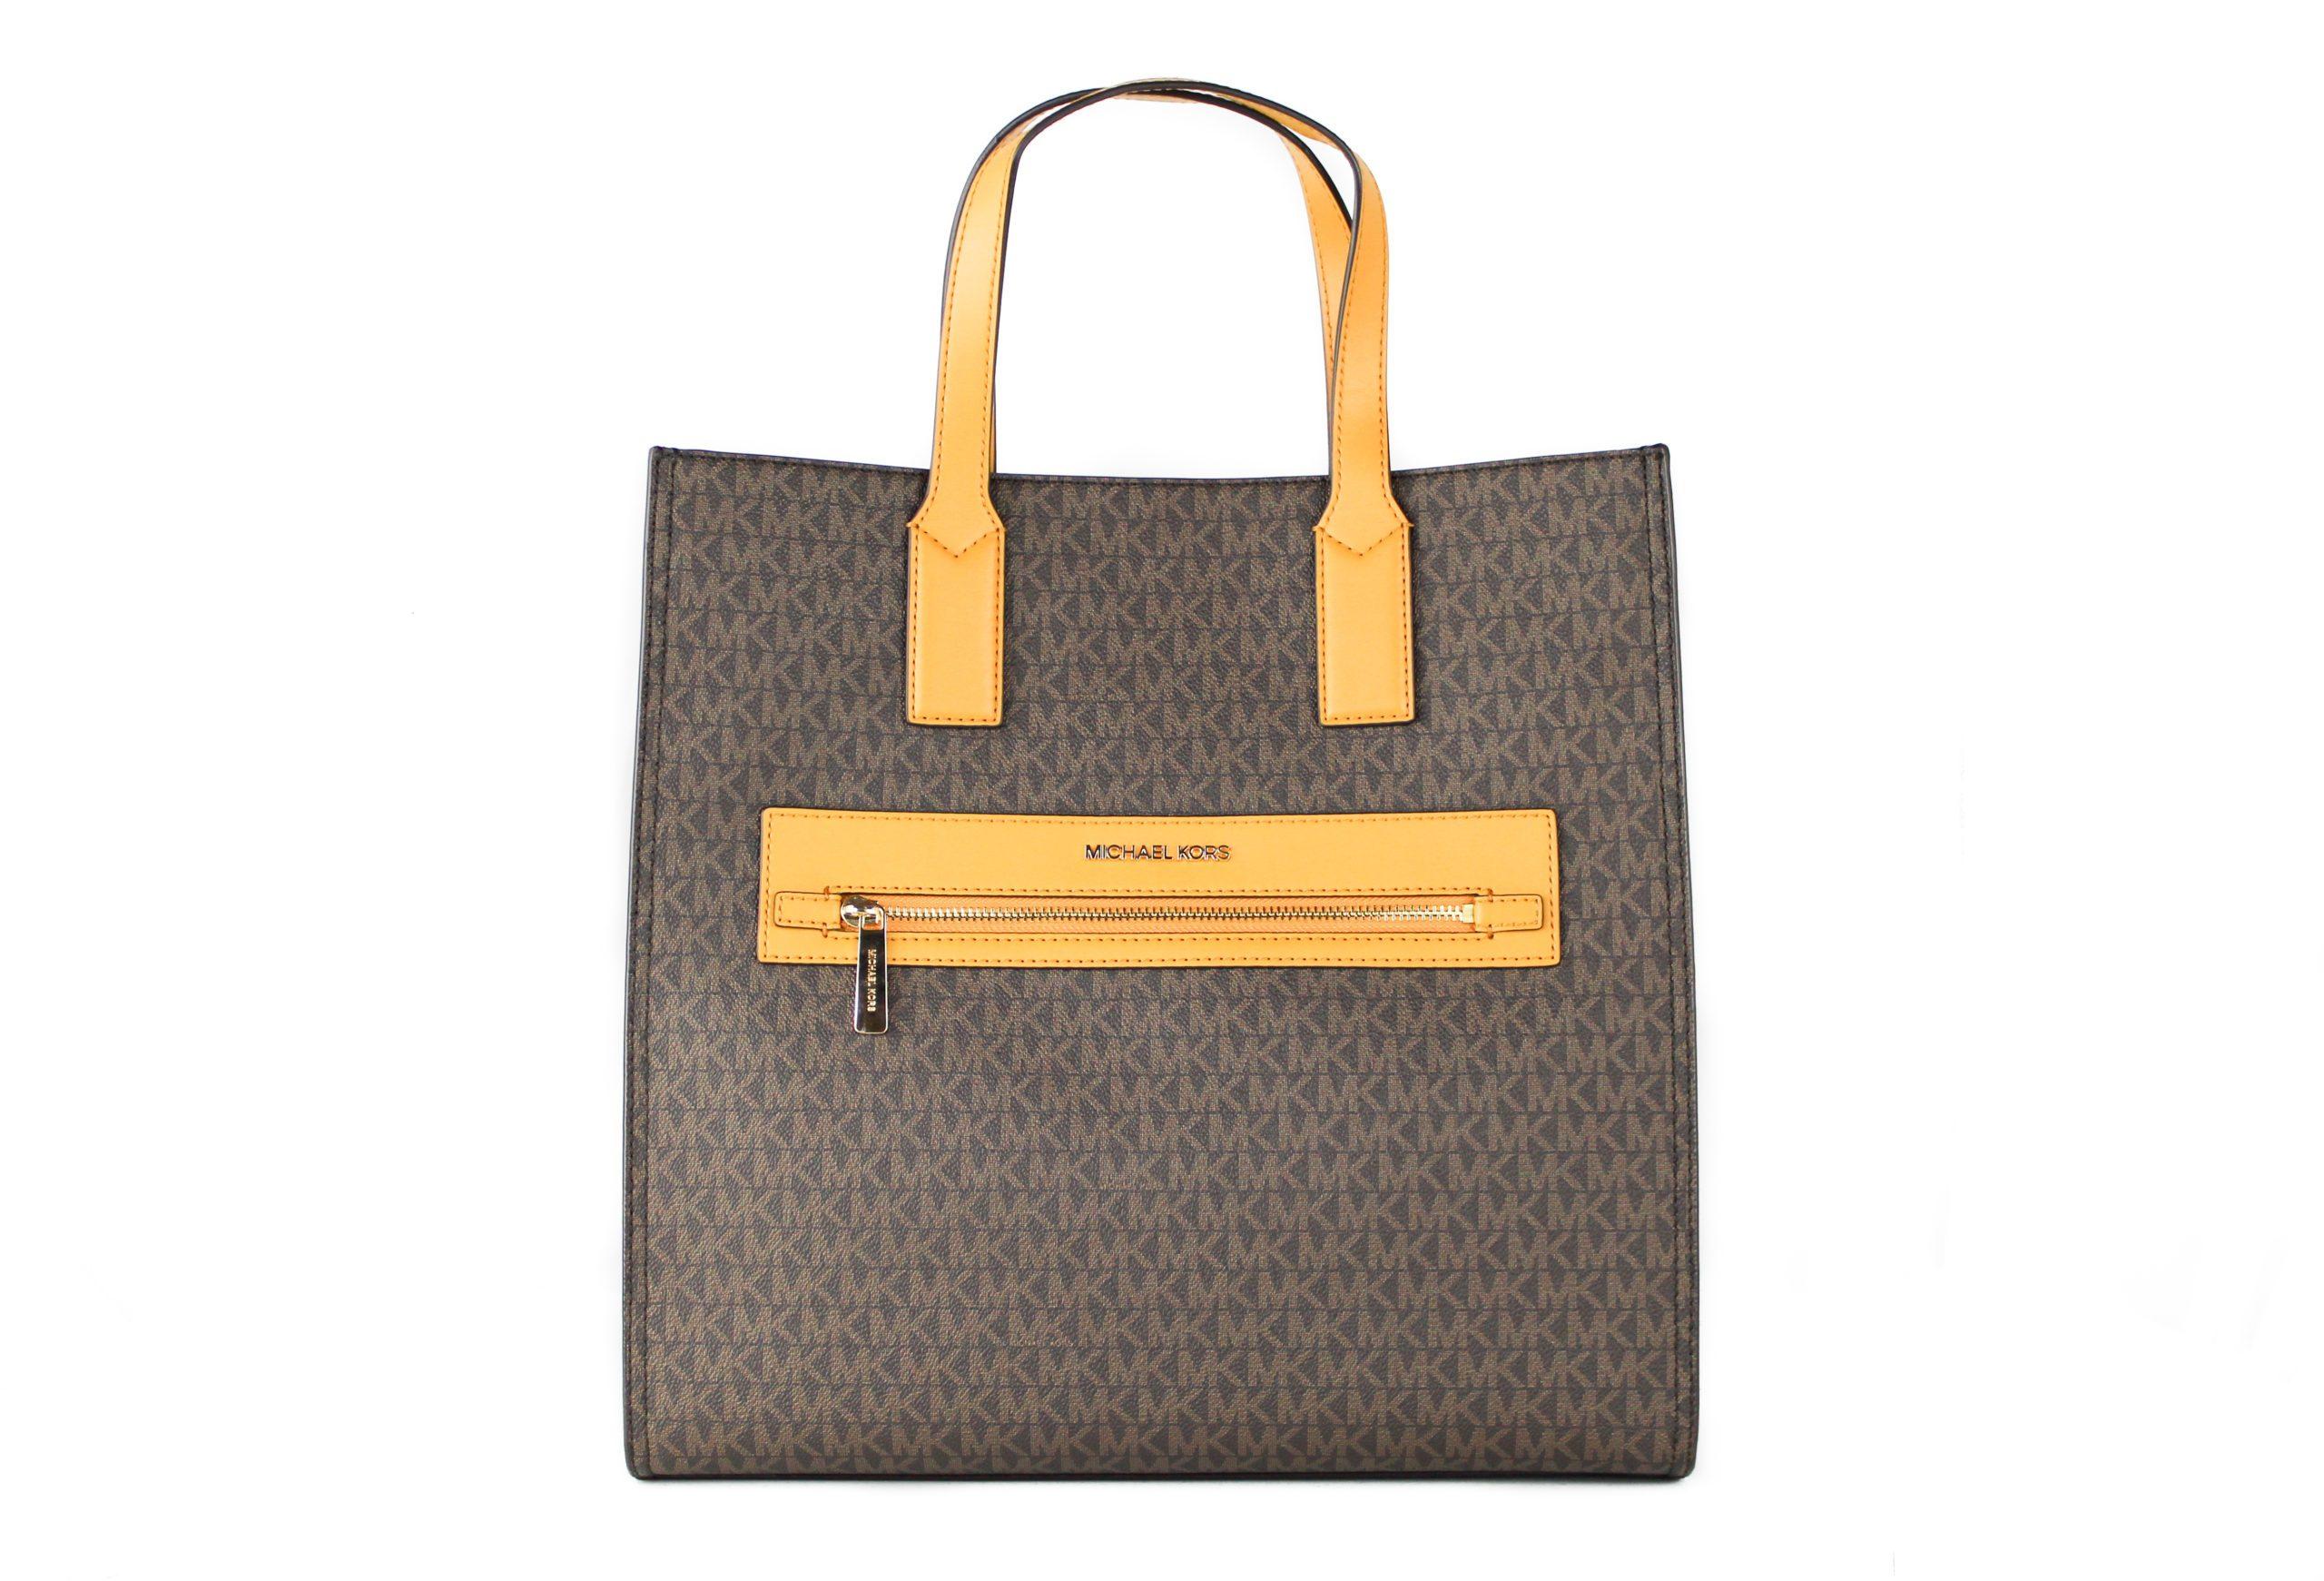 Michael Kors Women's Kenly Tote Bag Brown 81600